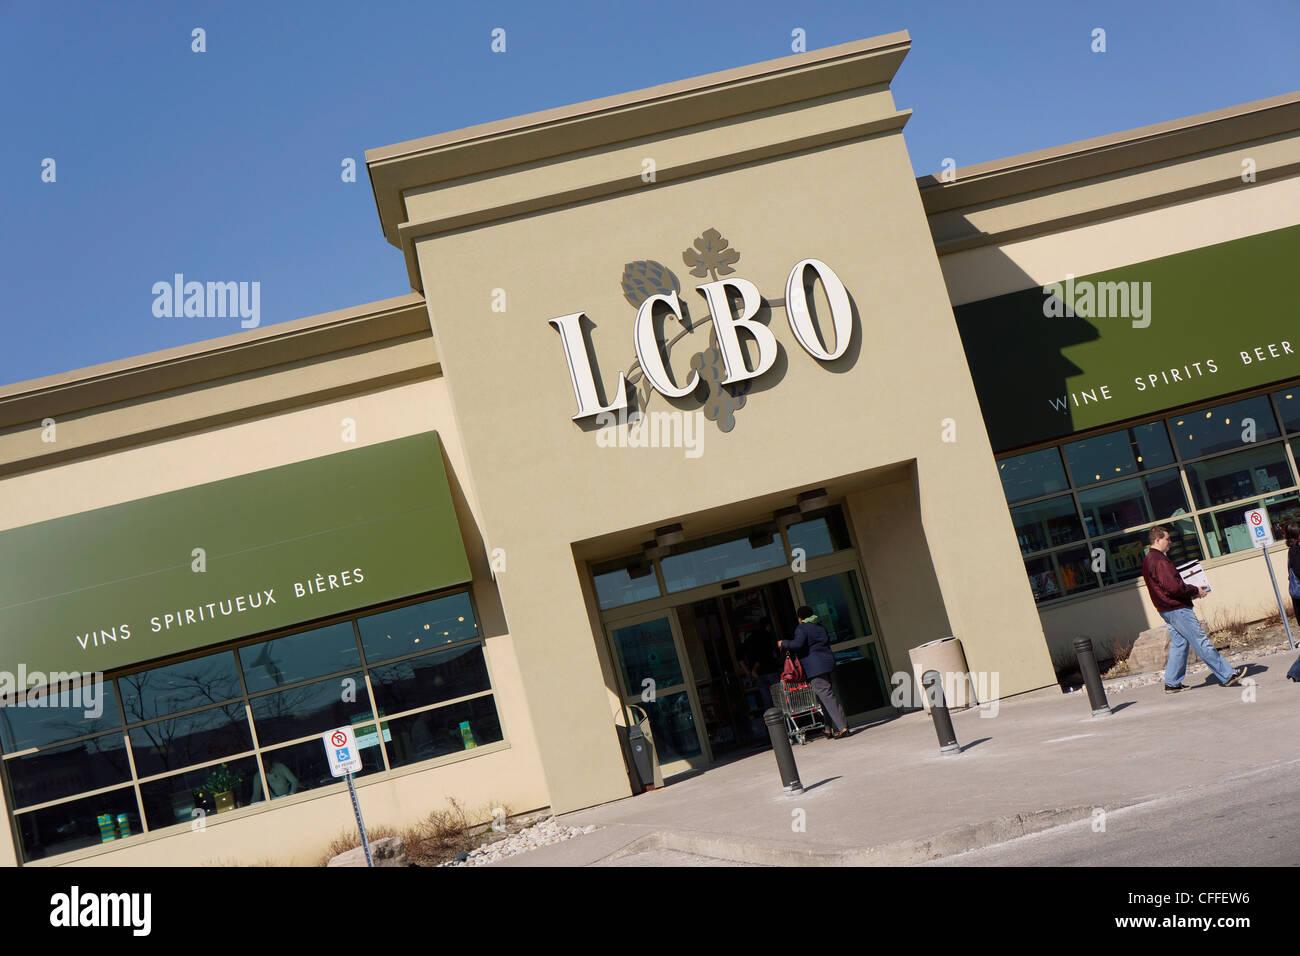 LCBO, Liquor Control Board of Ontario - Stock Image